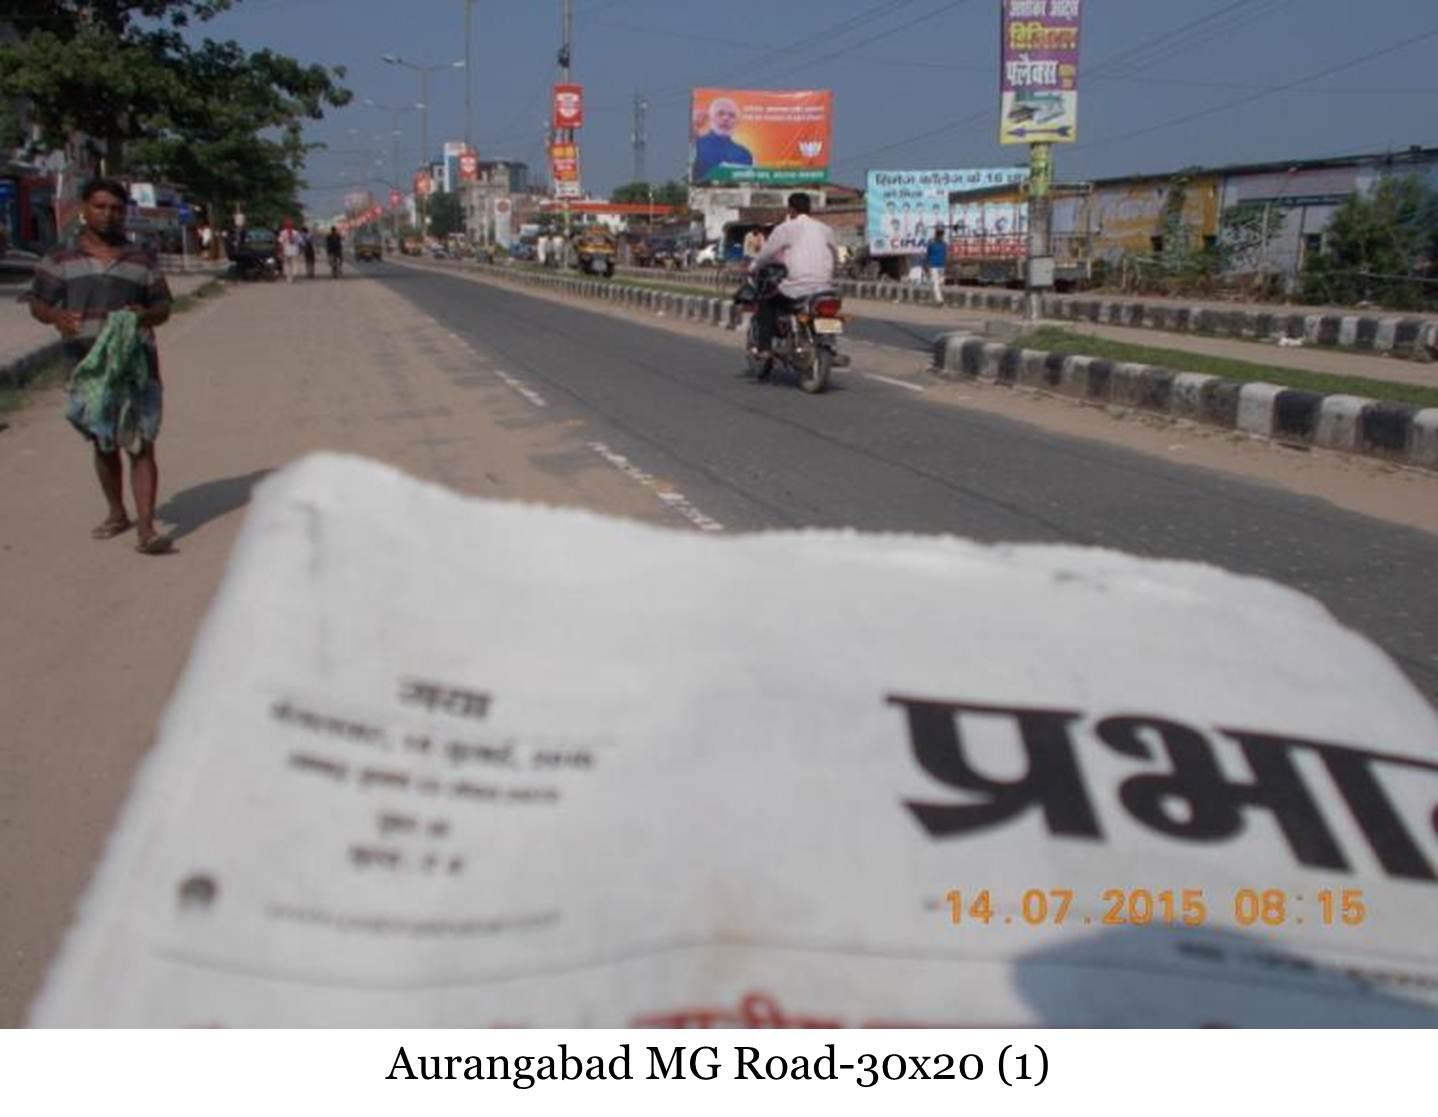 MG Rd, Aurangabad